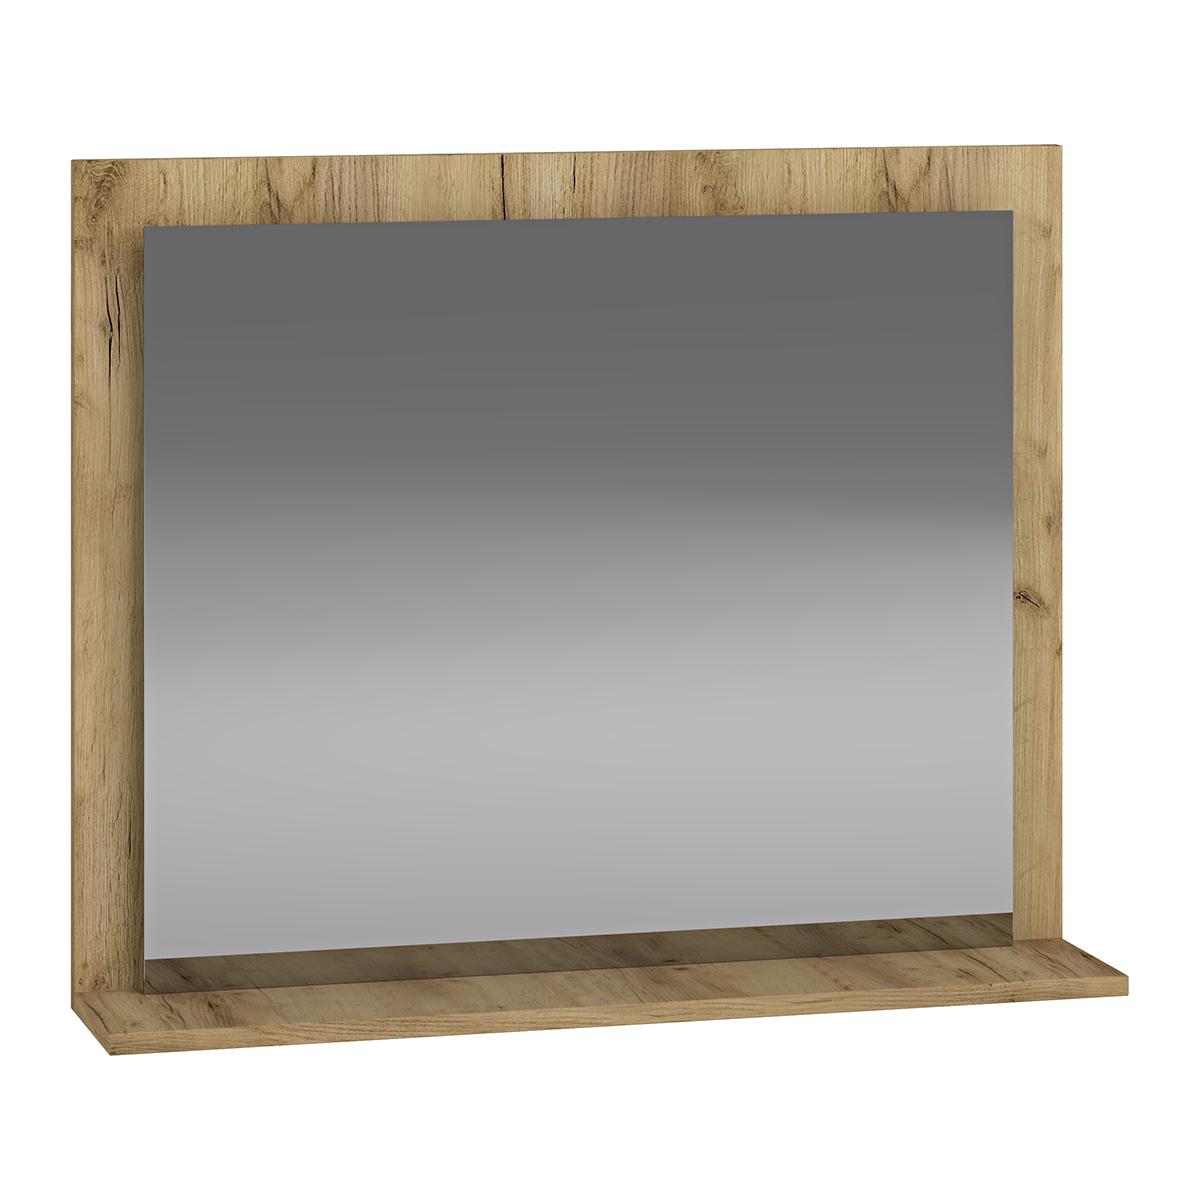 NABBI Baleta Z80 zrkadlo na stenu craft zlatý